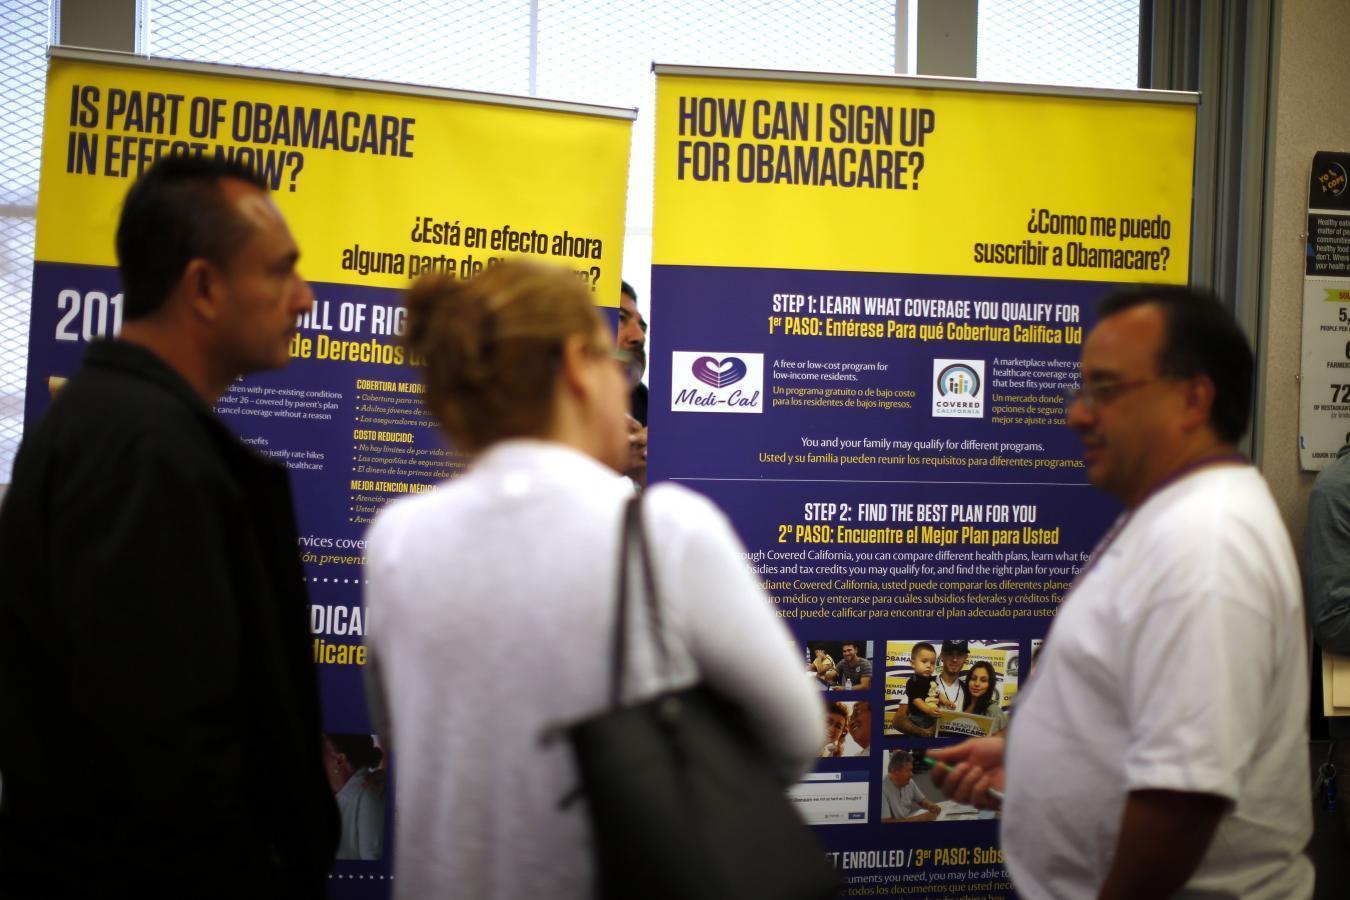 Obamacare 'accomplishing goal': Gallup poll